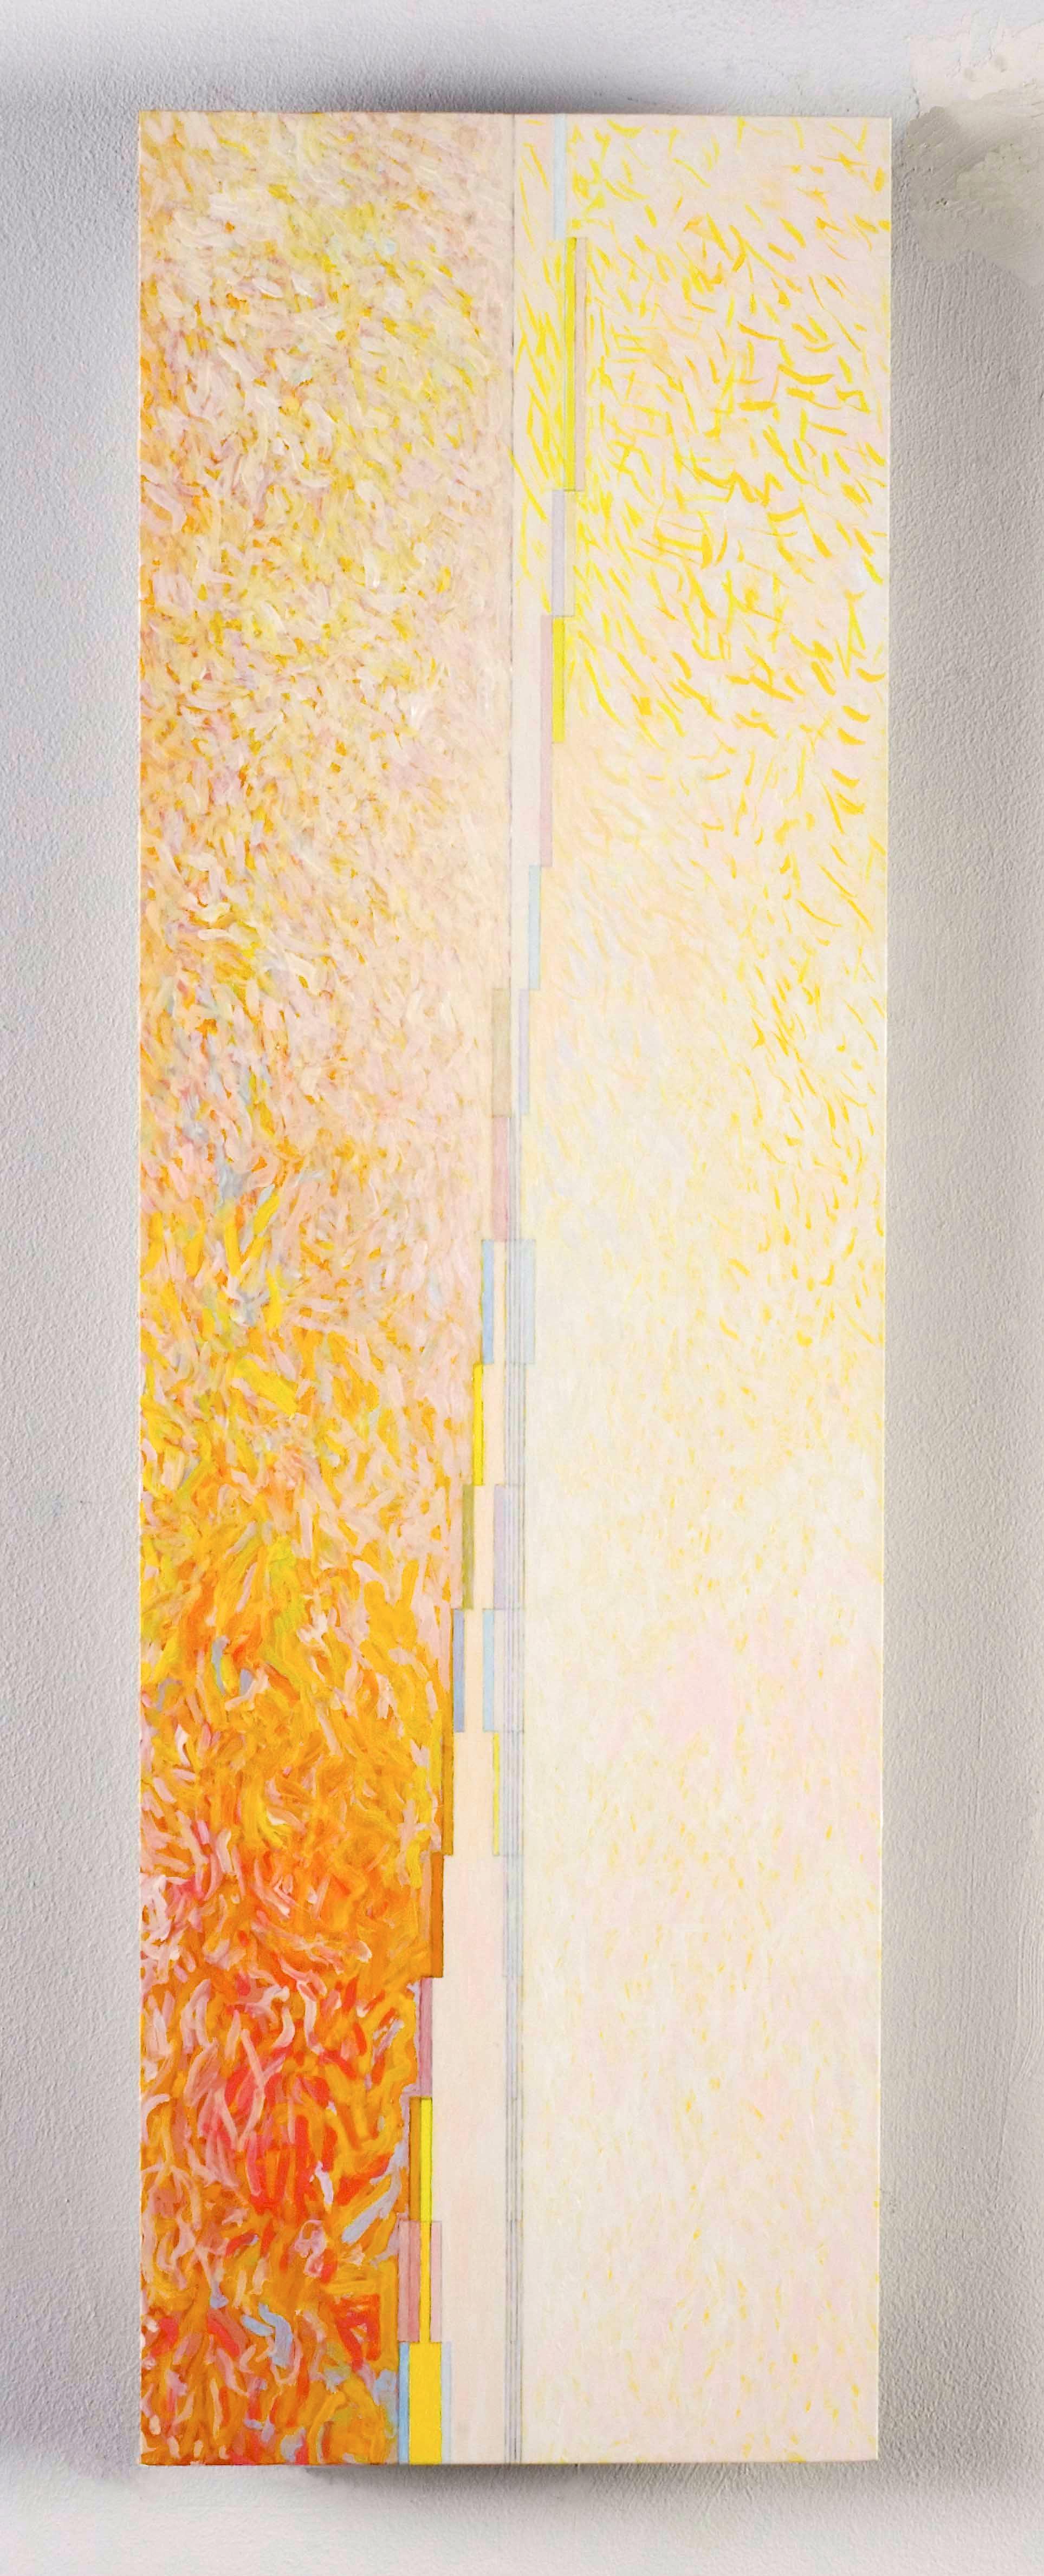 "Friedrich, 2006, oil on aluminum panel, 28 1-2""x9""x1/4"""